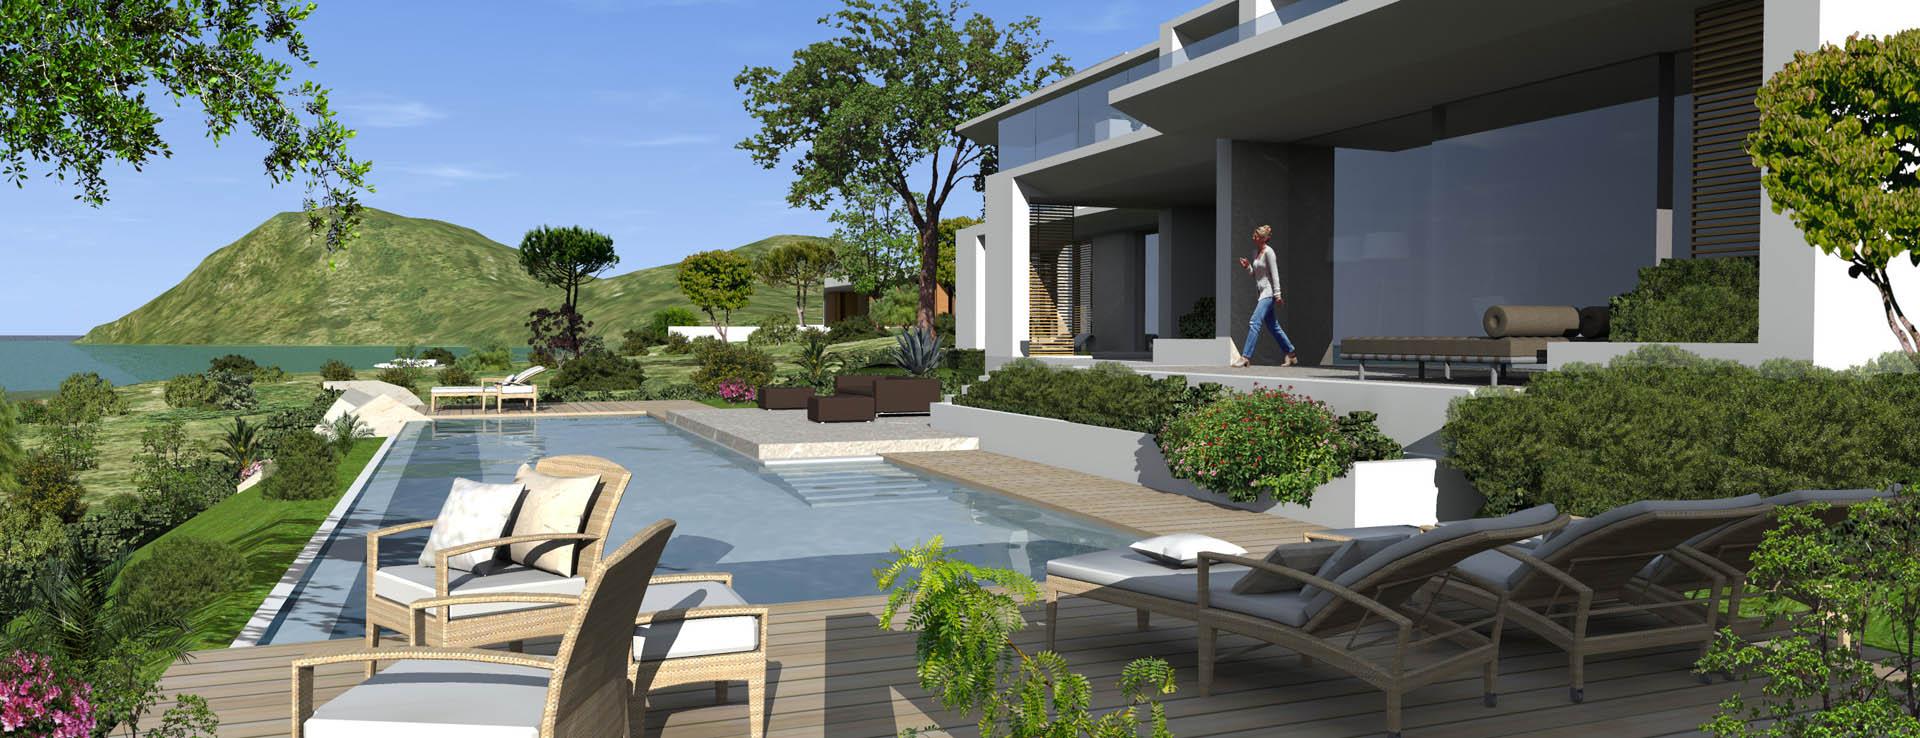 Studio Matteoni Villa Agapanto Golfo Aranci